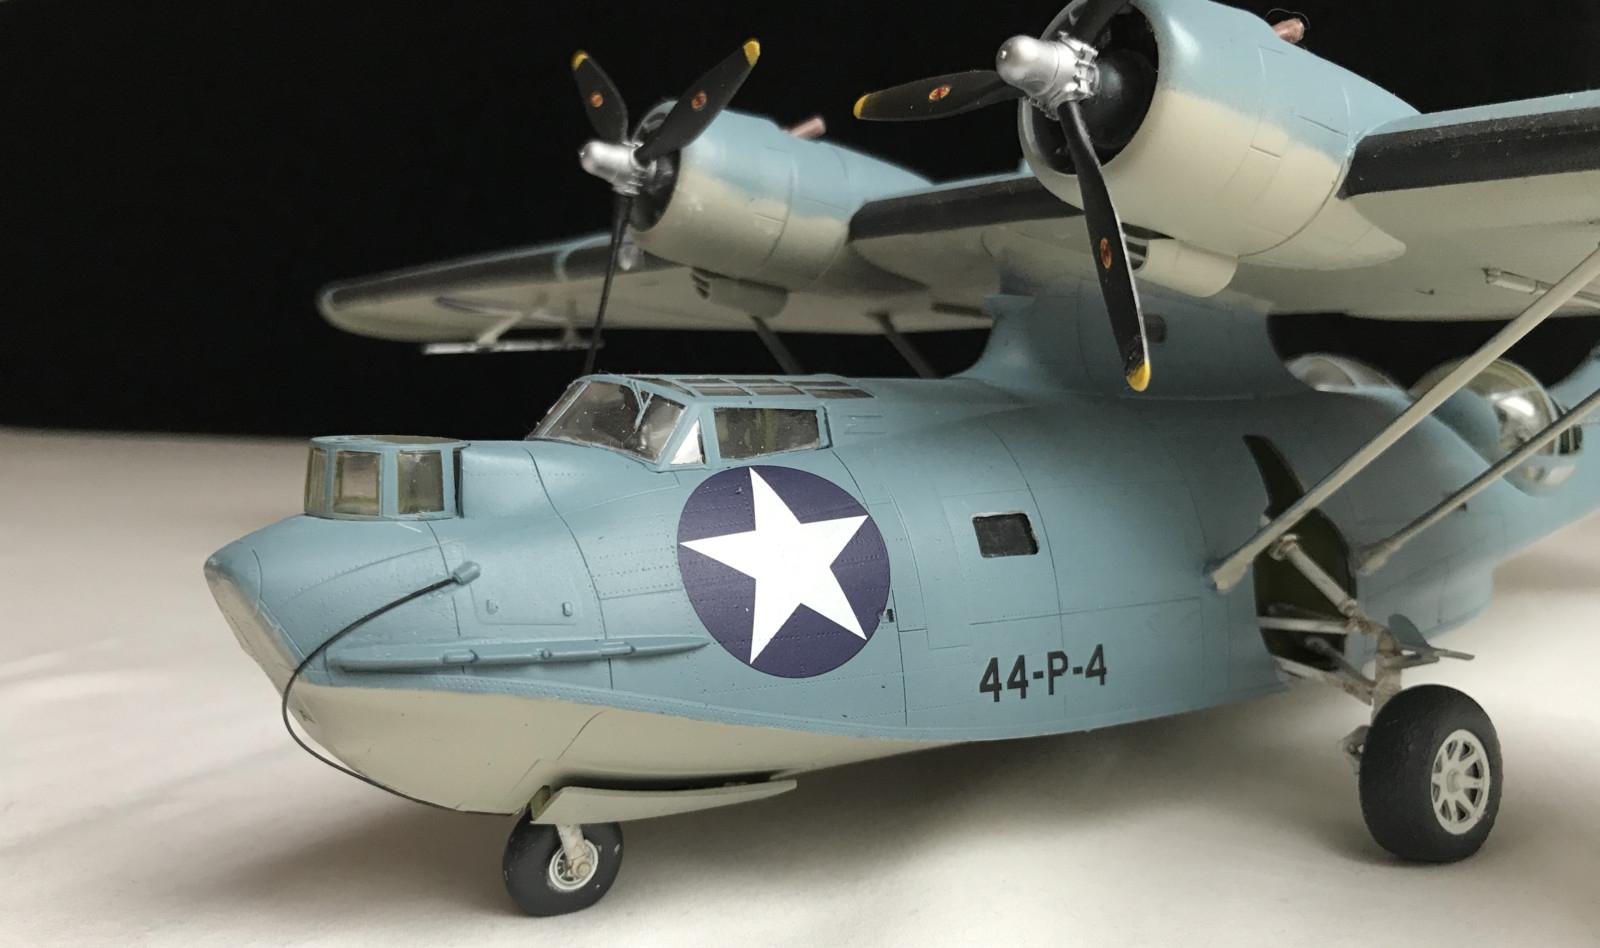 Jack Reid's PBY Catalina 44-P-4